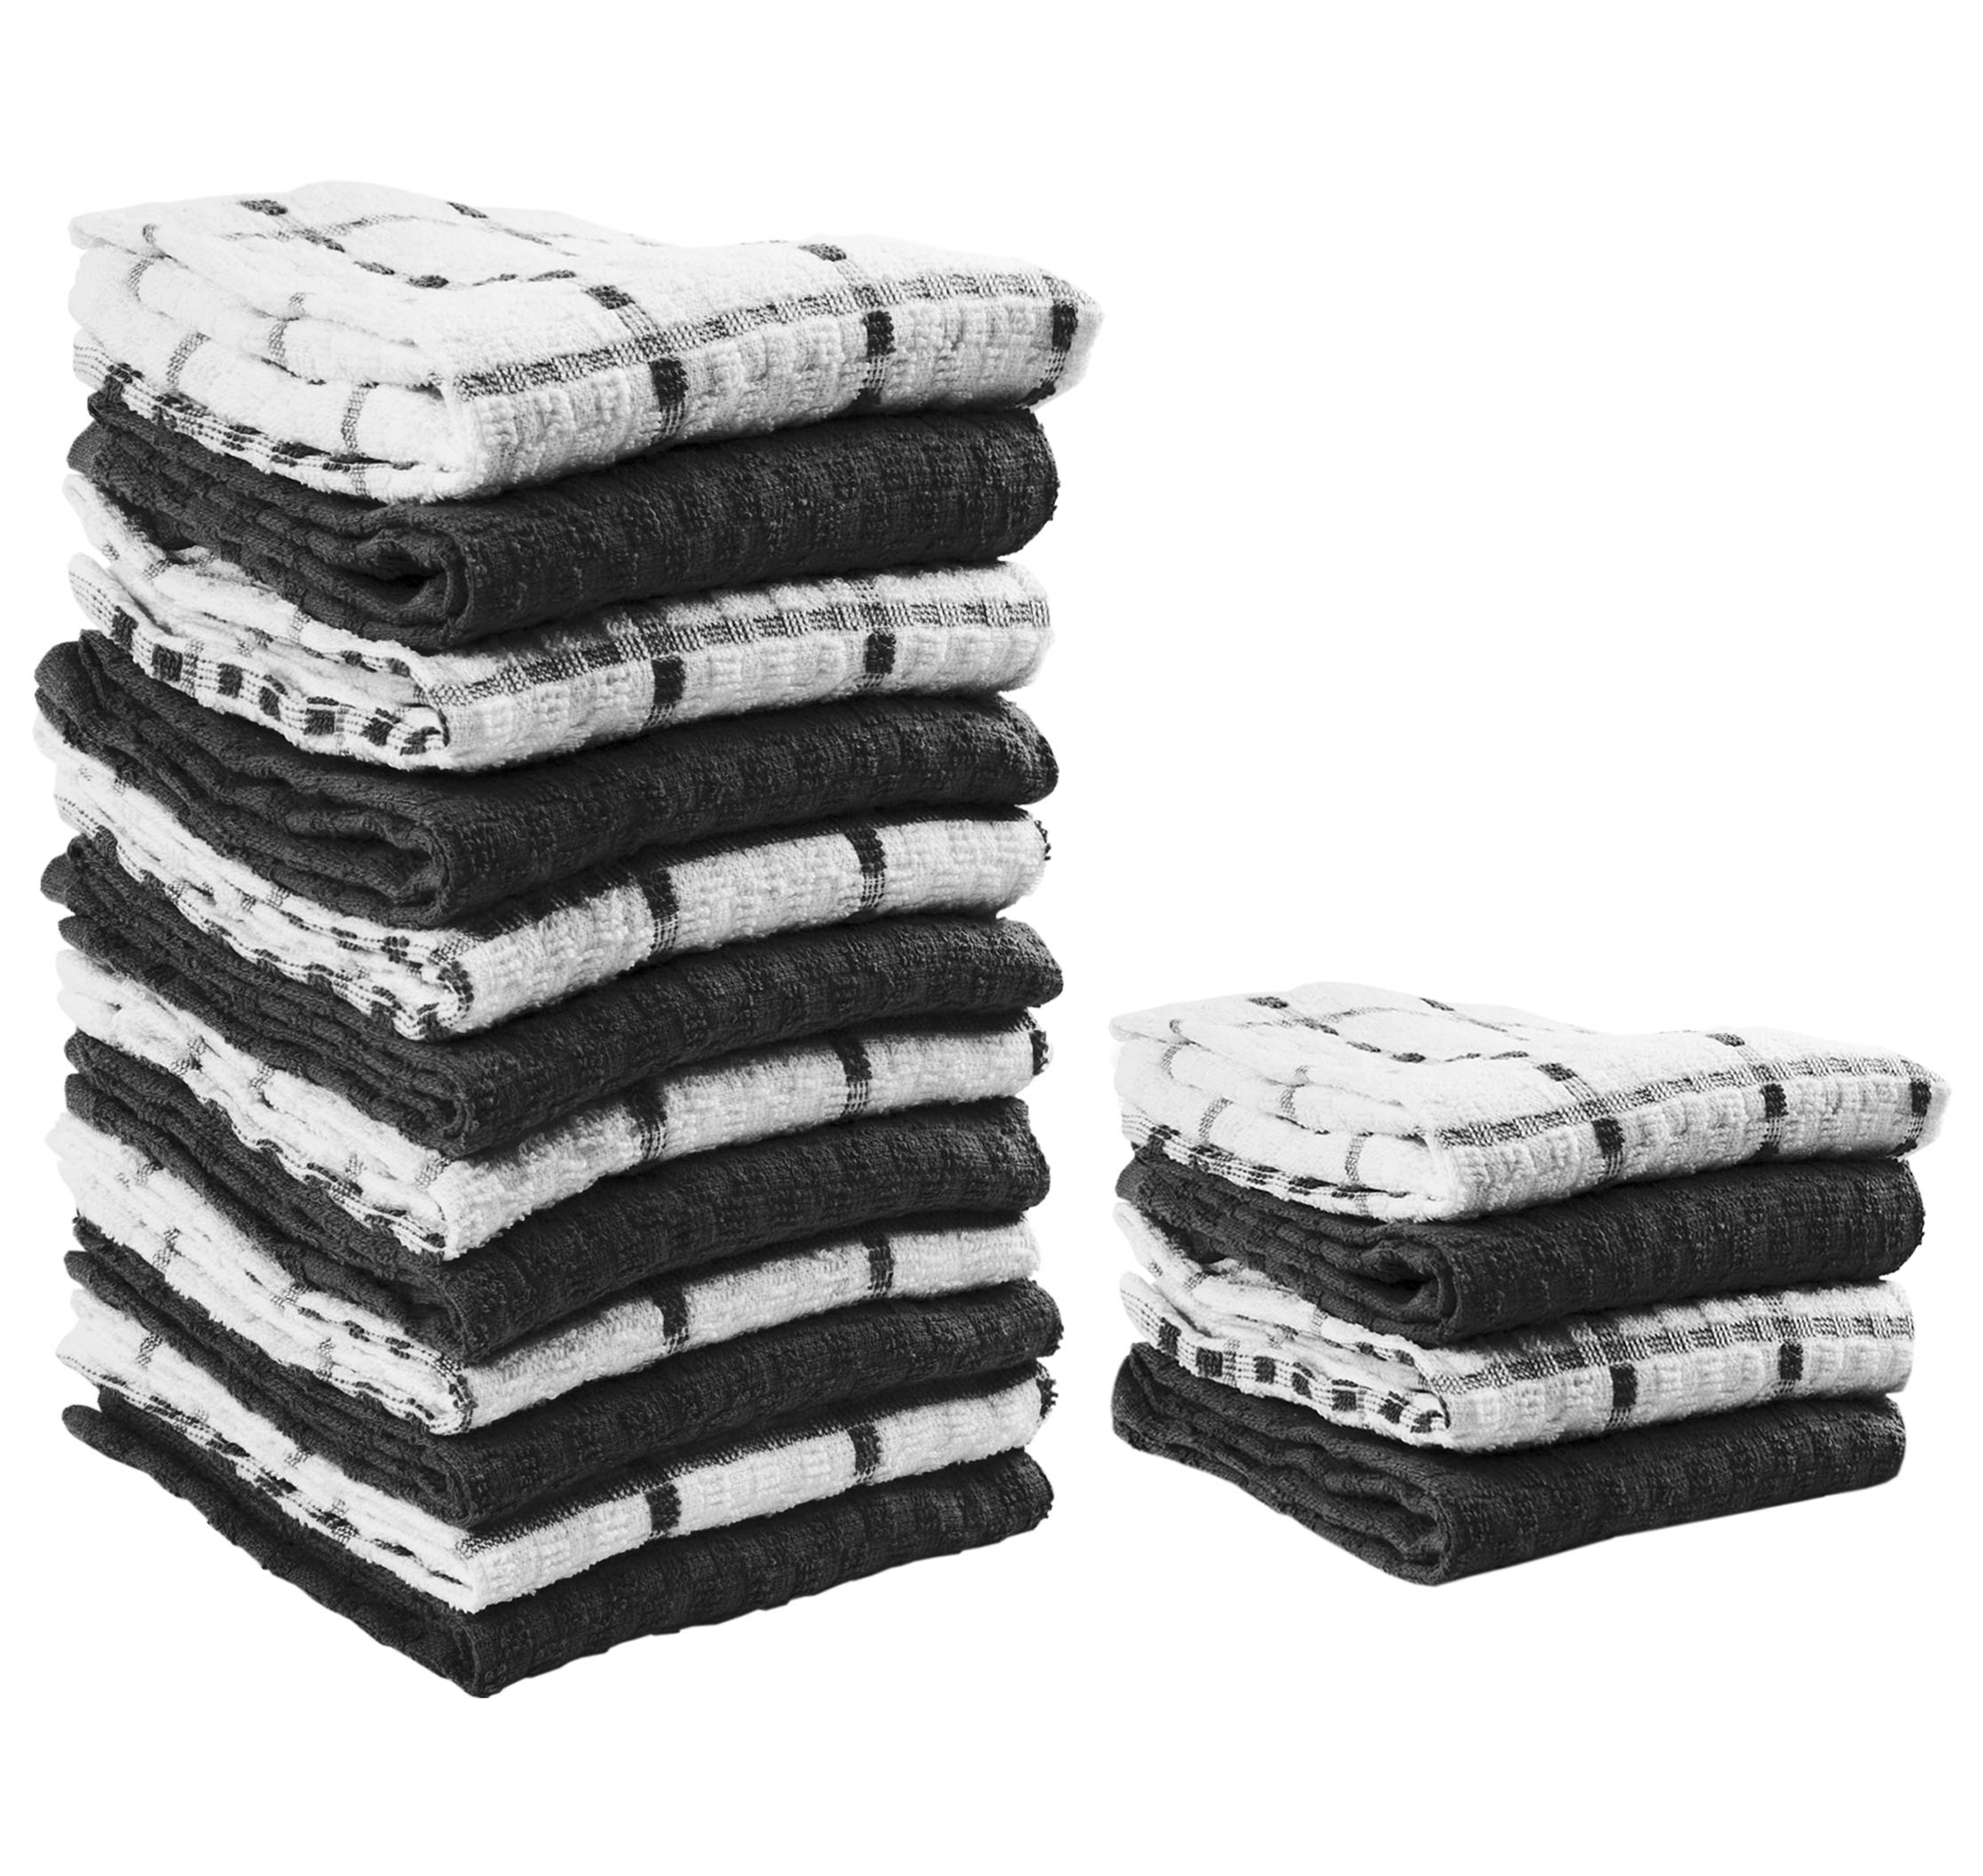 Value Basics Kitchen Towel Set, 15'' x 25'', 16-Piece Dobby Weave Kitchen Dish Towel Value Pack (12 standard set + 4 towels FREE)